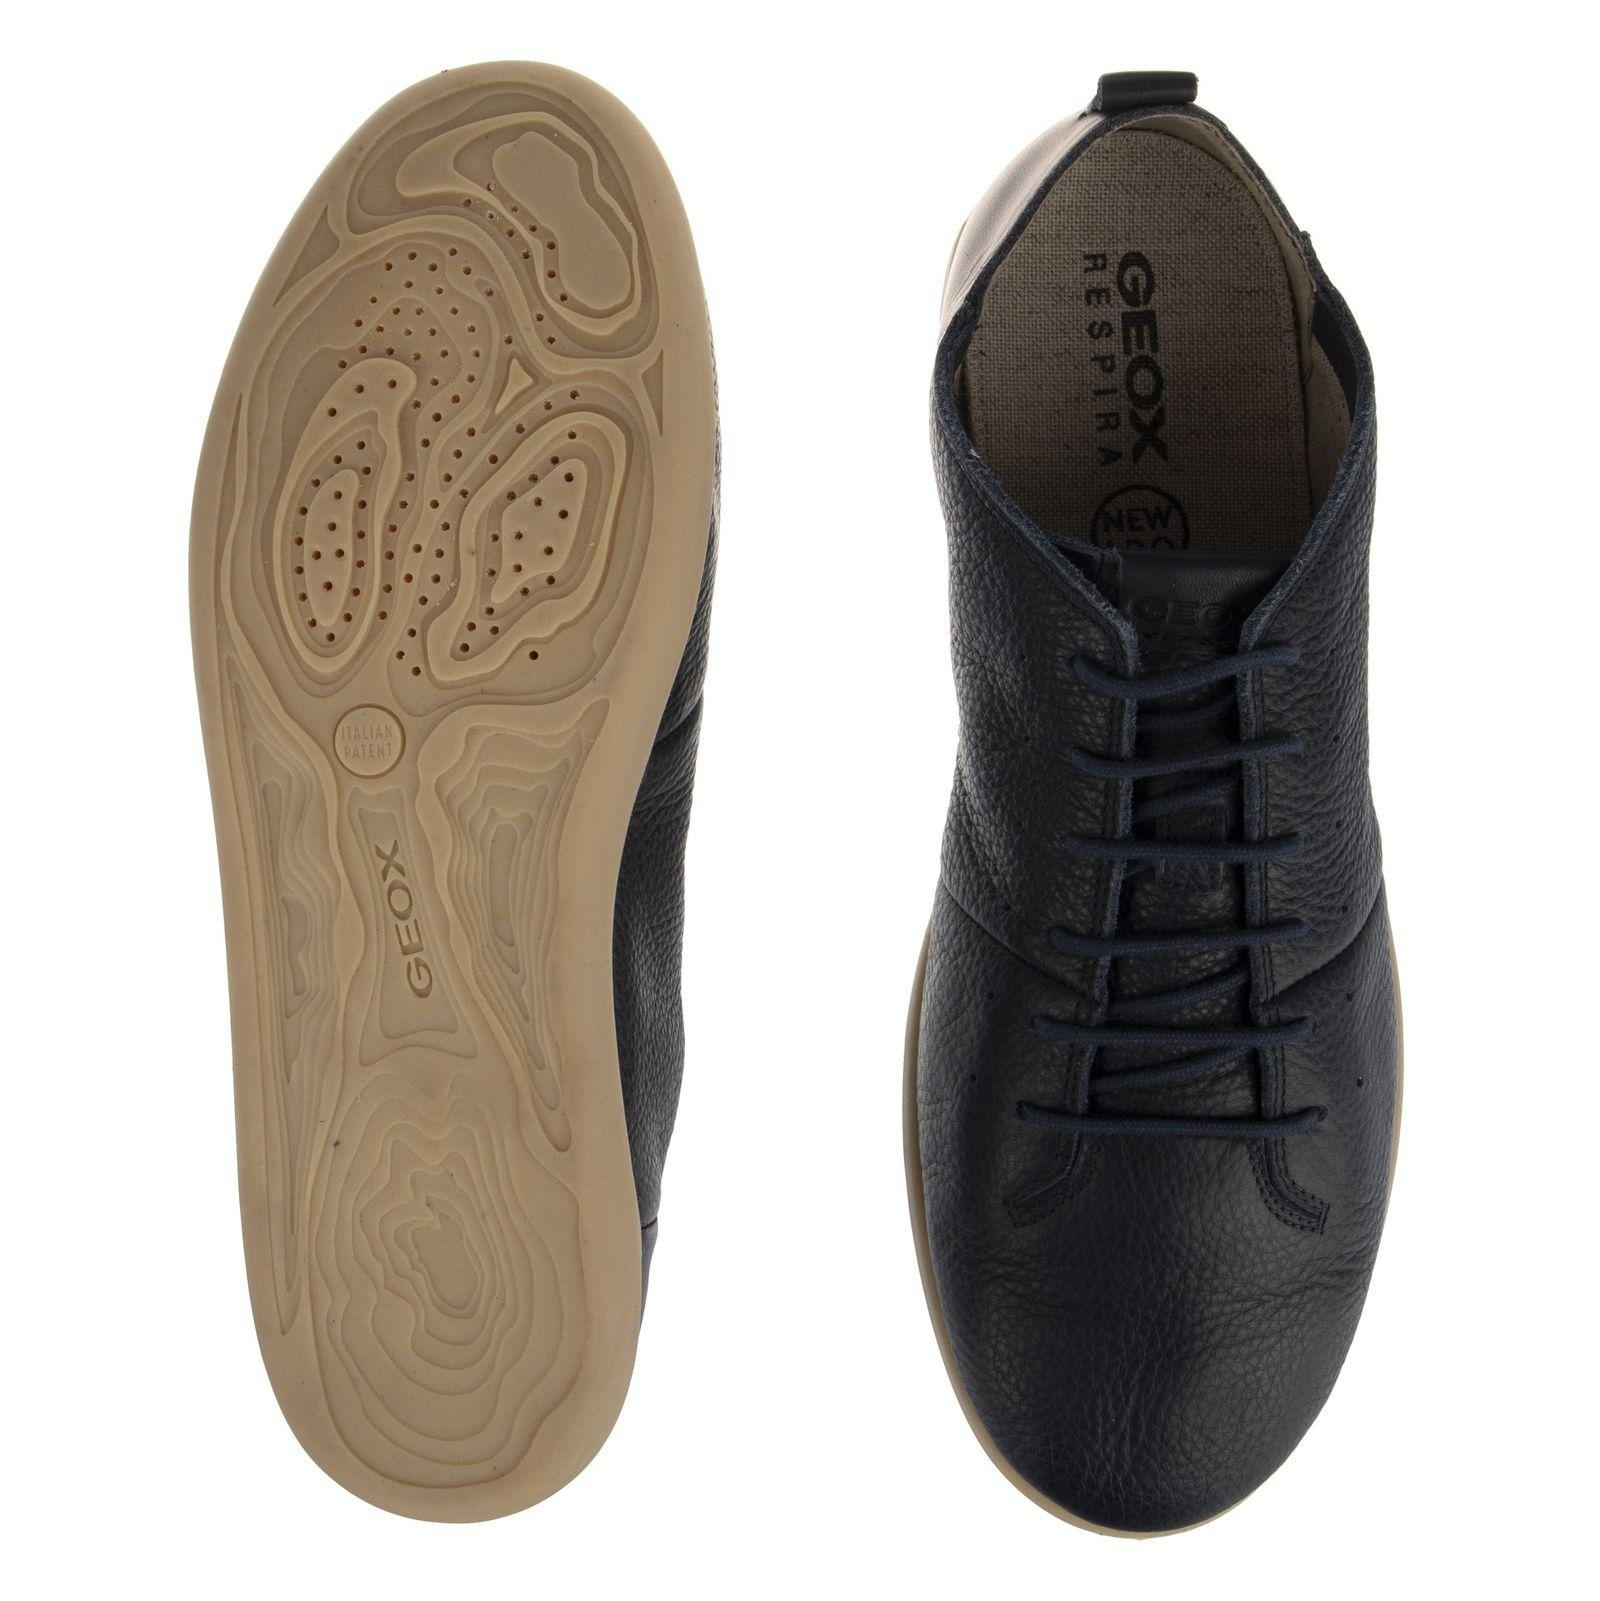 کفش روزمره مردانه جی اوکس مدل U620QB-04643-C4002 -  - 2